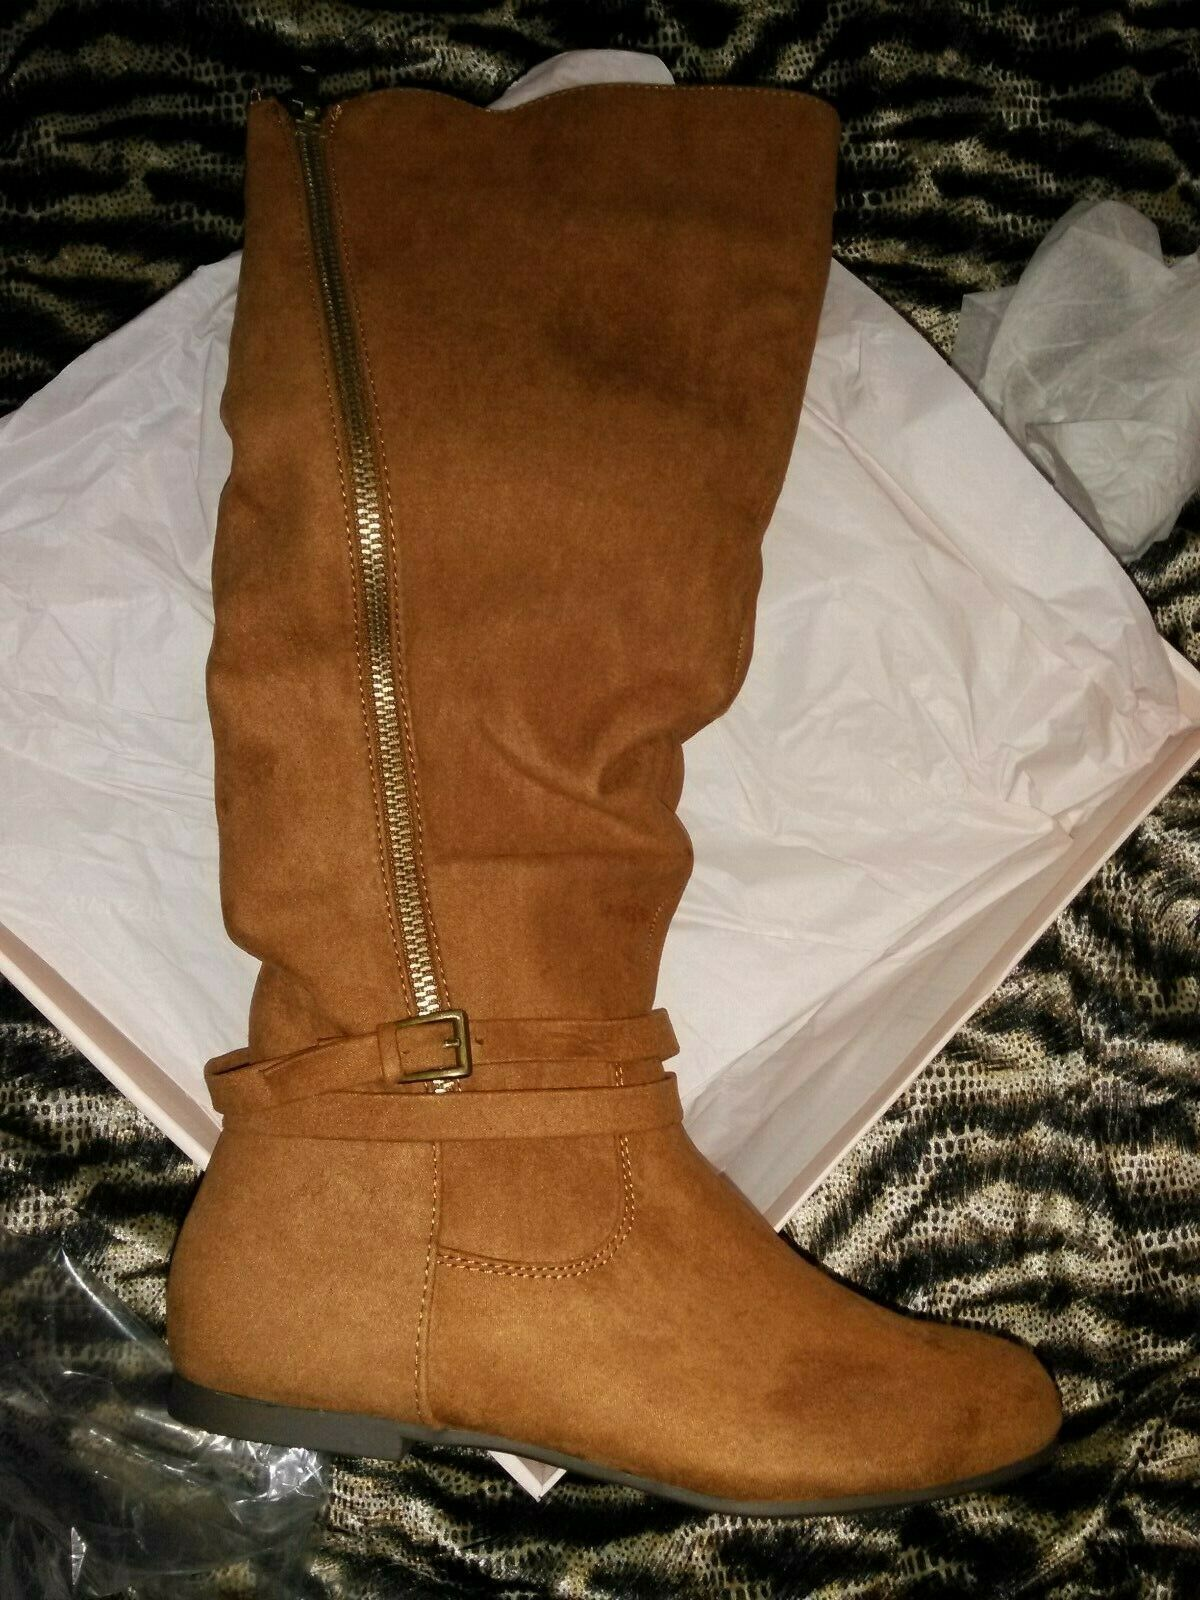 JUST FAB Boots BROWN Flats Women's 6.5